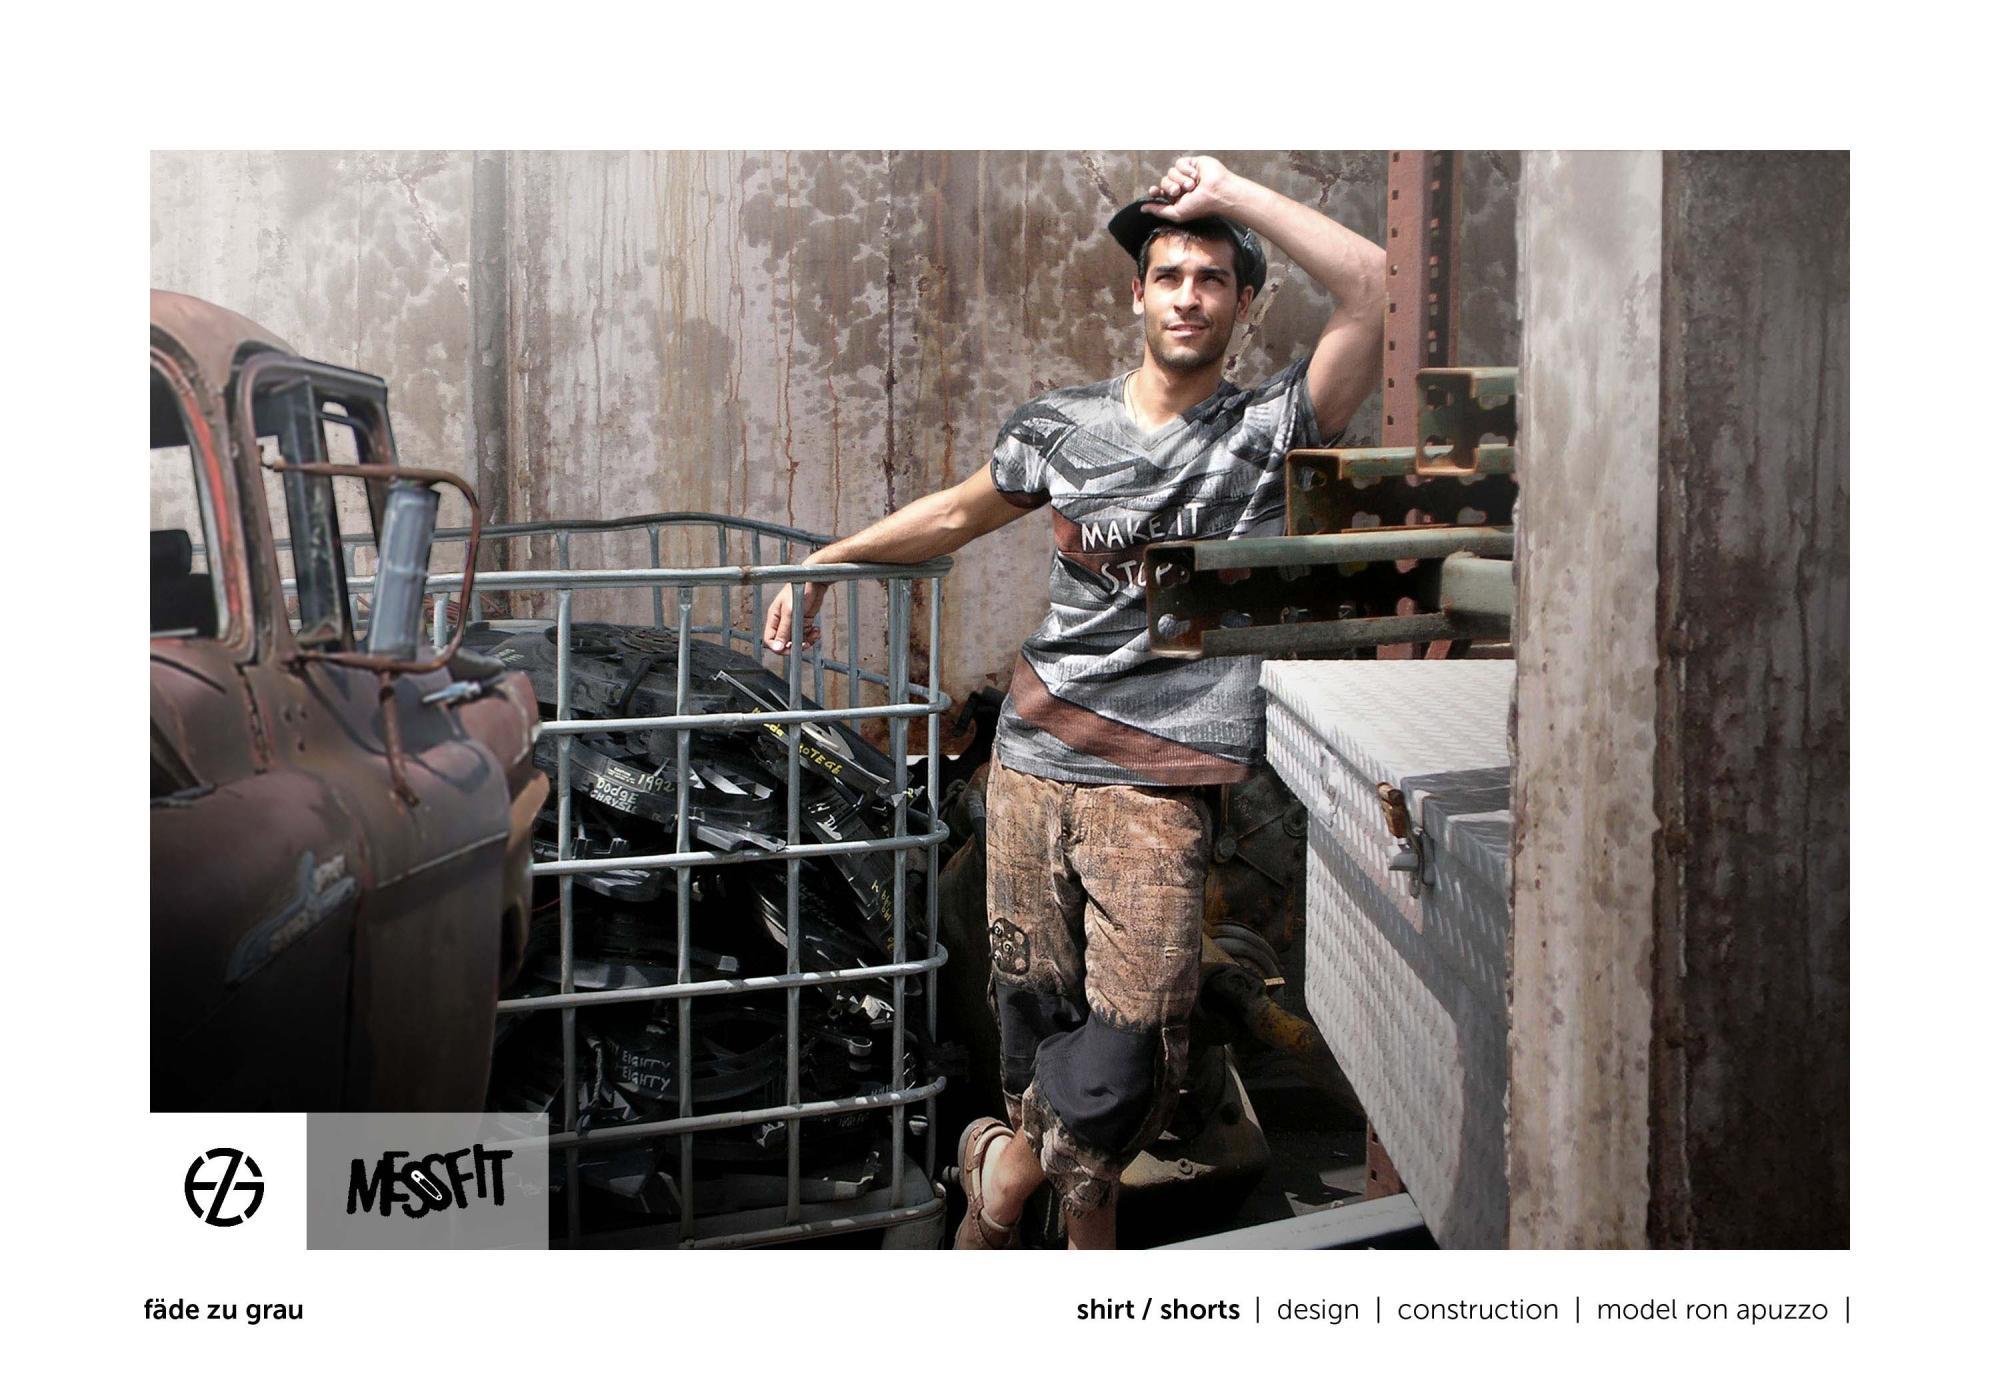 fäde zu grau | photo shoot | shirt, shorts